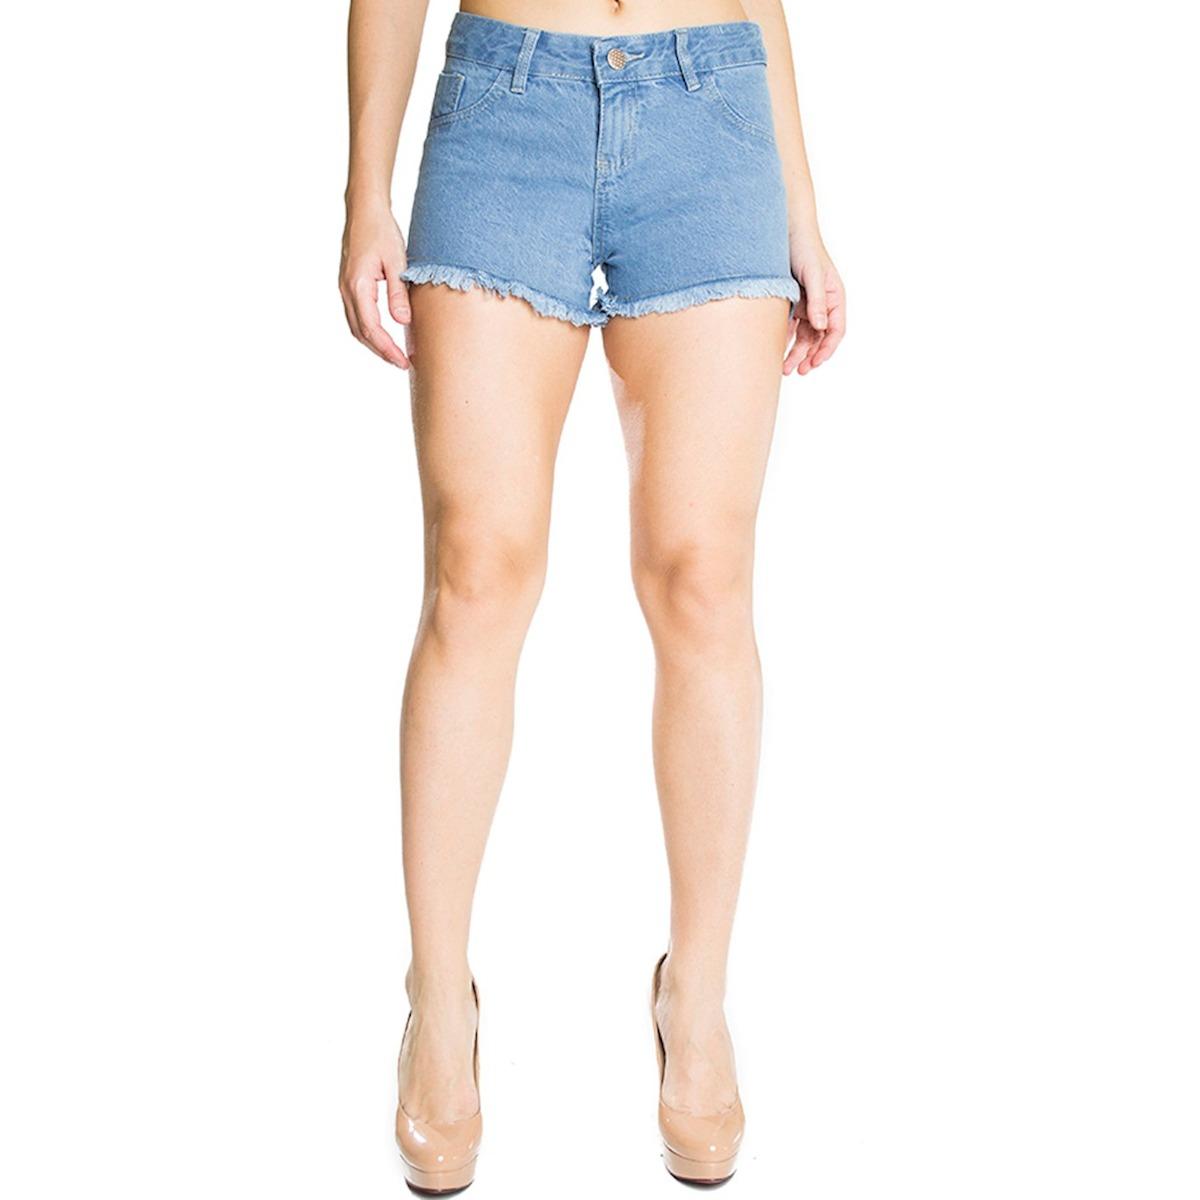 6c8458b91d Short Jeans Feminino Zamany Azul Claro Com Barra Desfiada - R  69